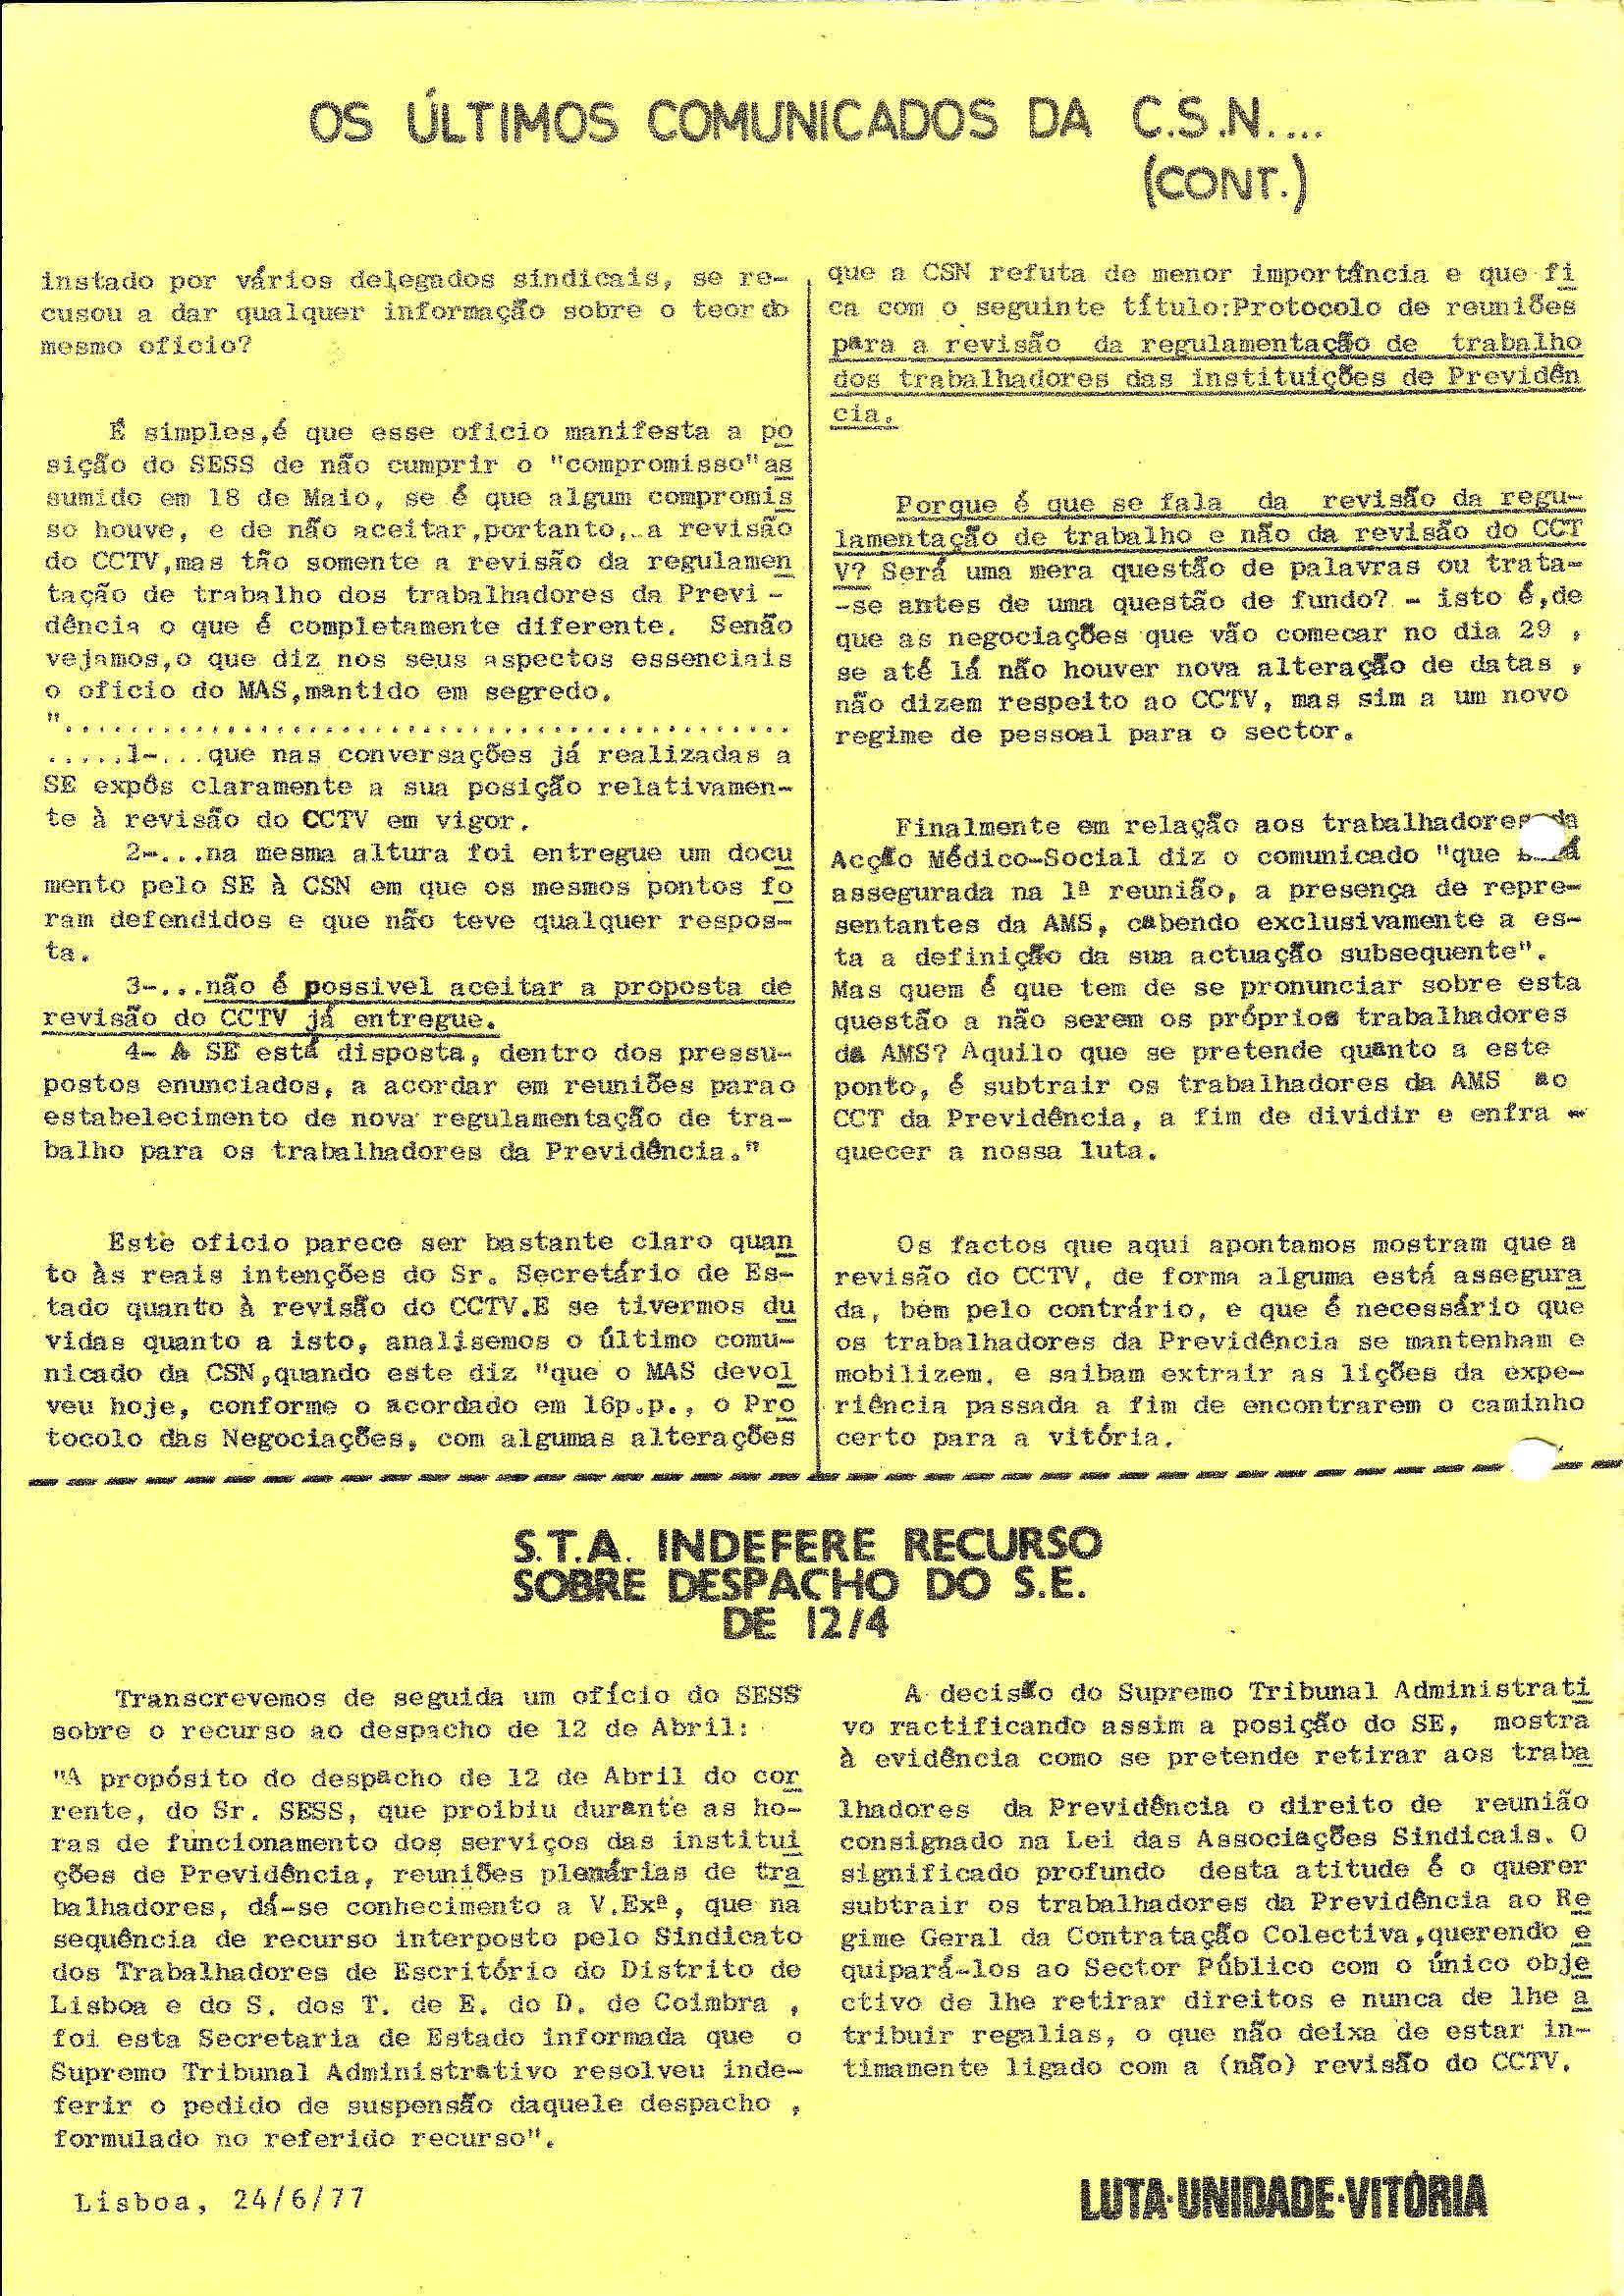 2 Sind Trab Previdência Jornal de Luta n 2 Junho 1977 2